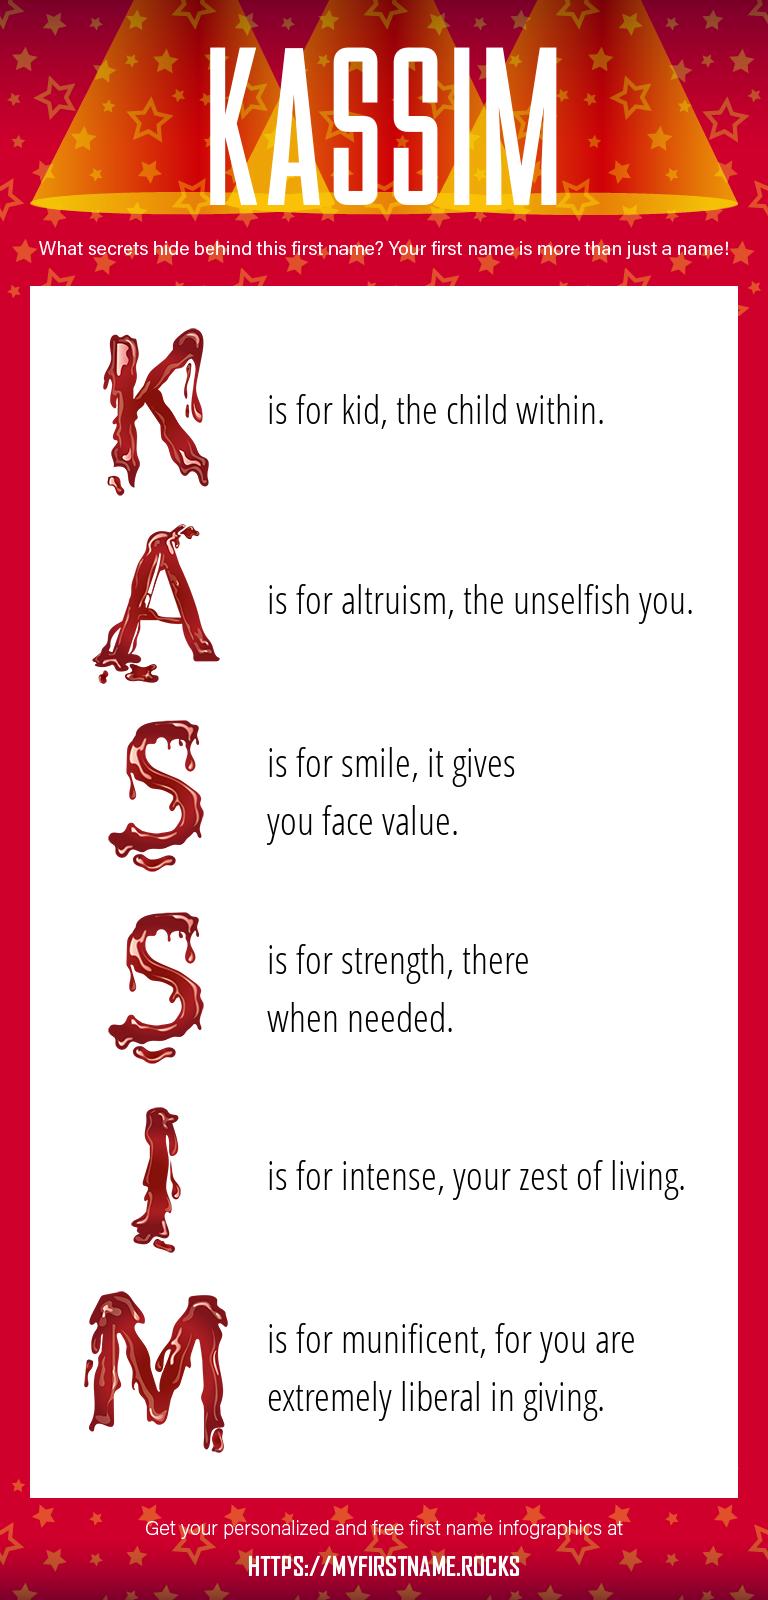 Kassim Infographics